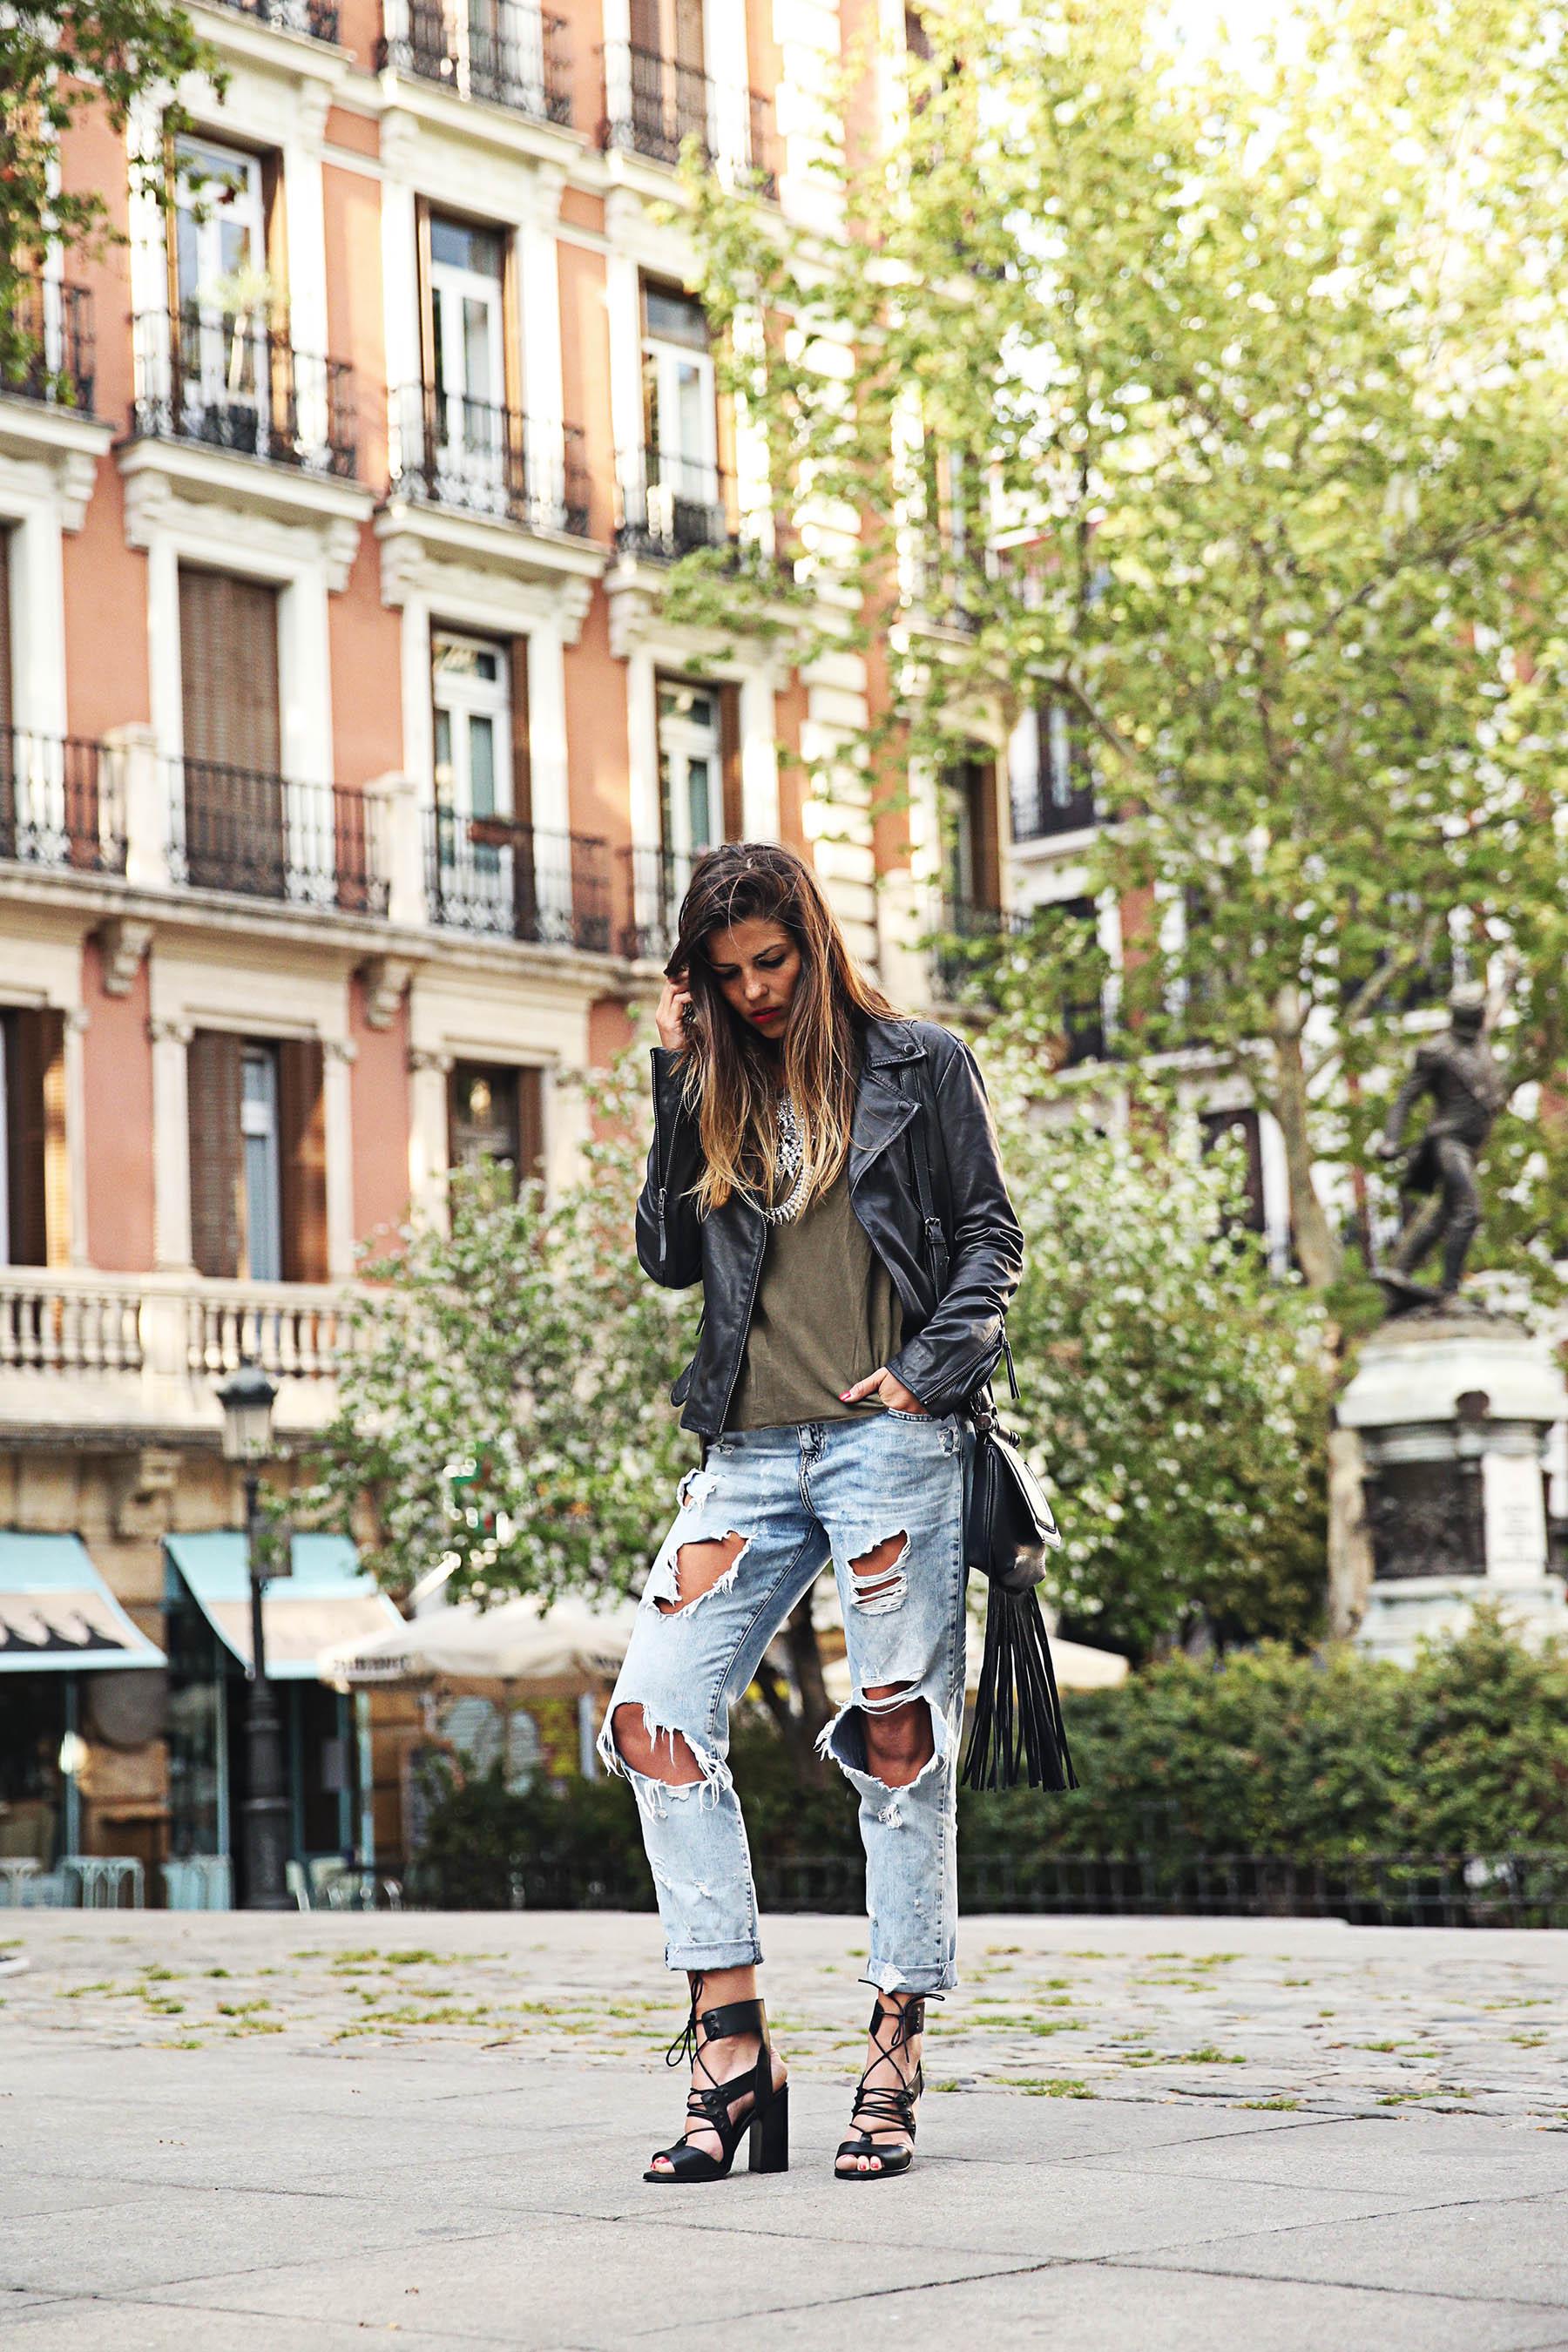 trendy-taste-look-outfit-street-style-ootd-blog-blogger-fashion-spain-moda-españa-boyfriend-vaqueros-jeans-steve-madden-sandalias-verano-primavera-leather-jacket-chaqueta-cuero-khaki-caqui-ripped-rotos-5